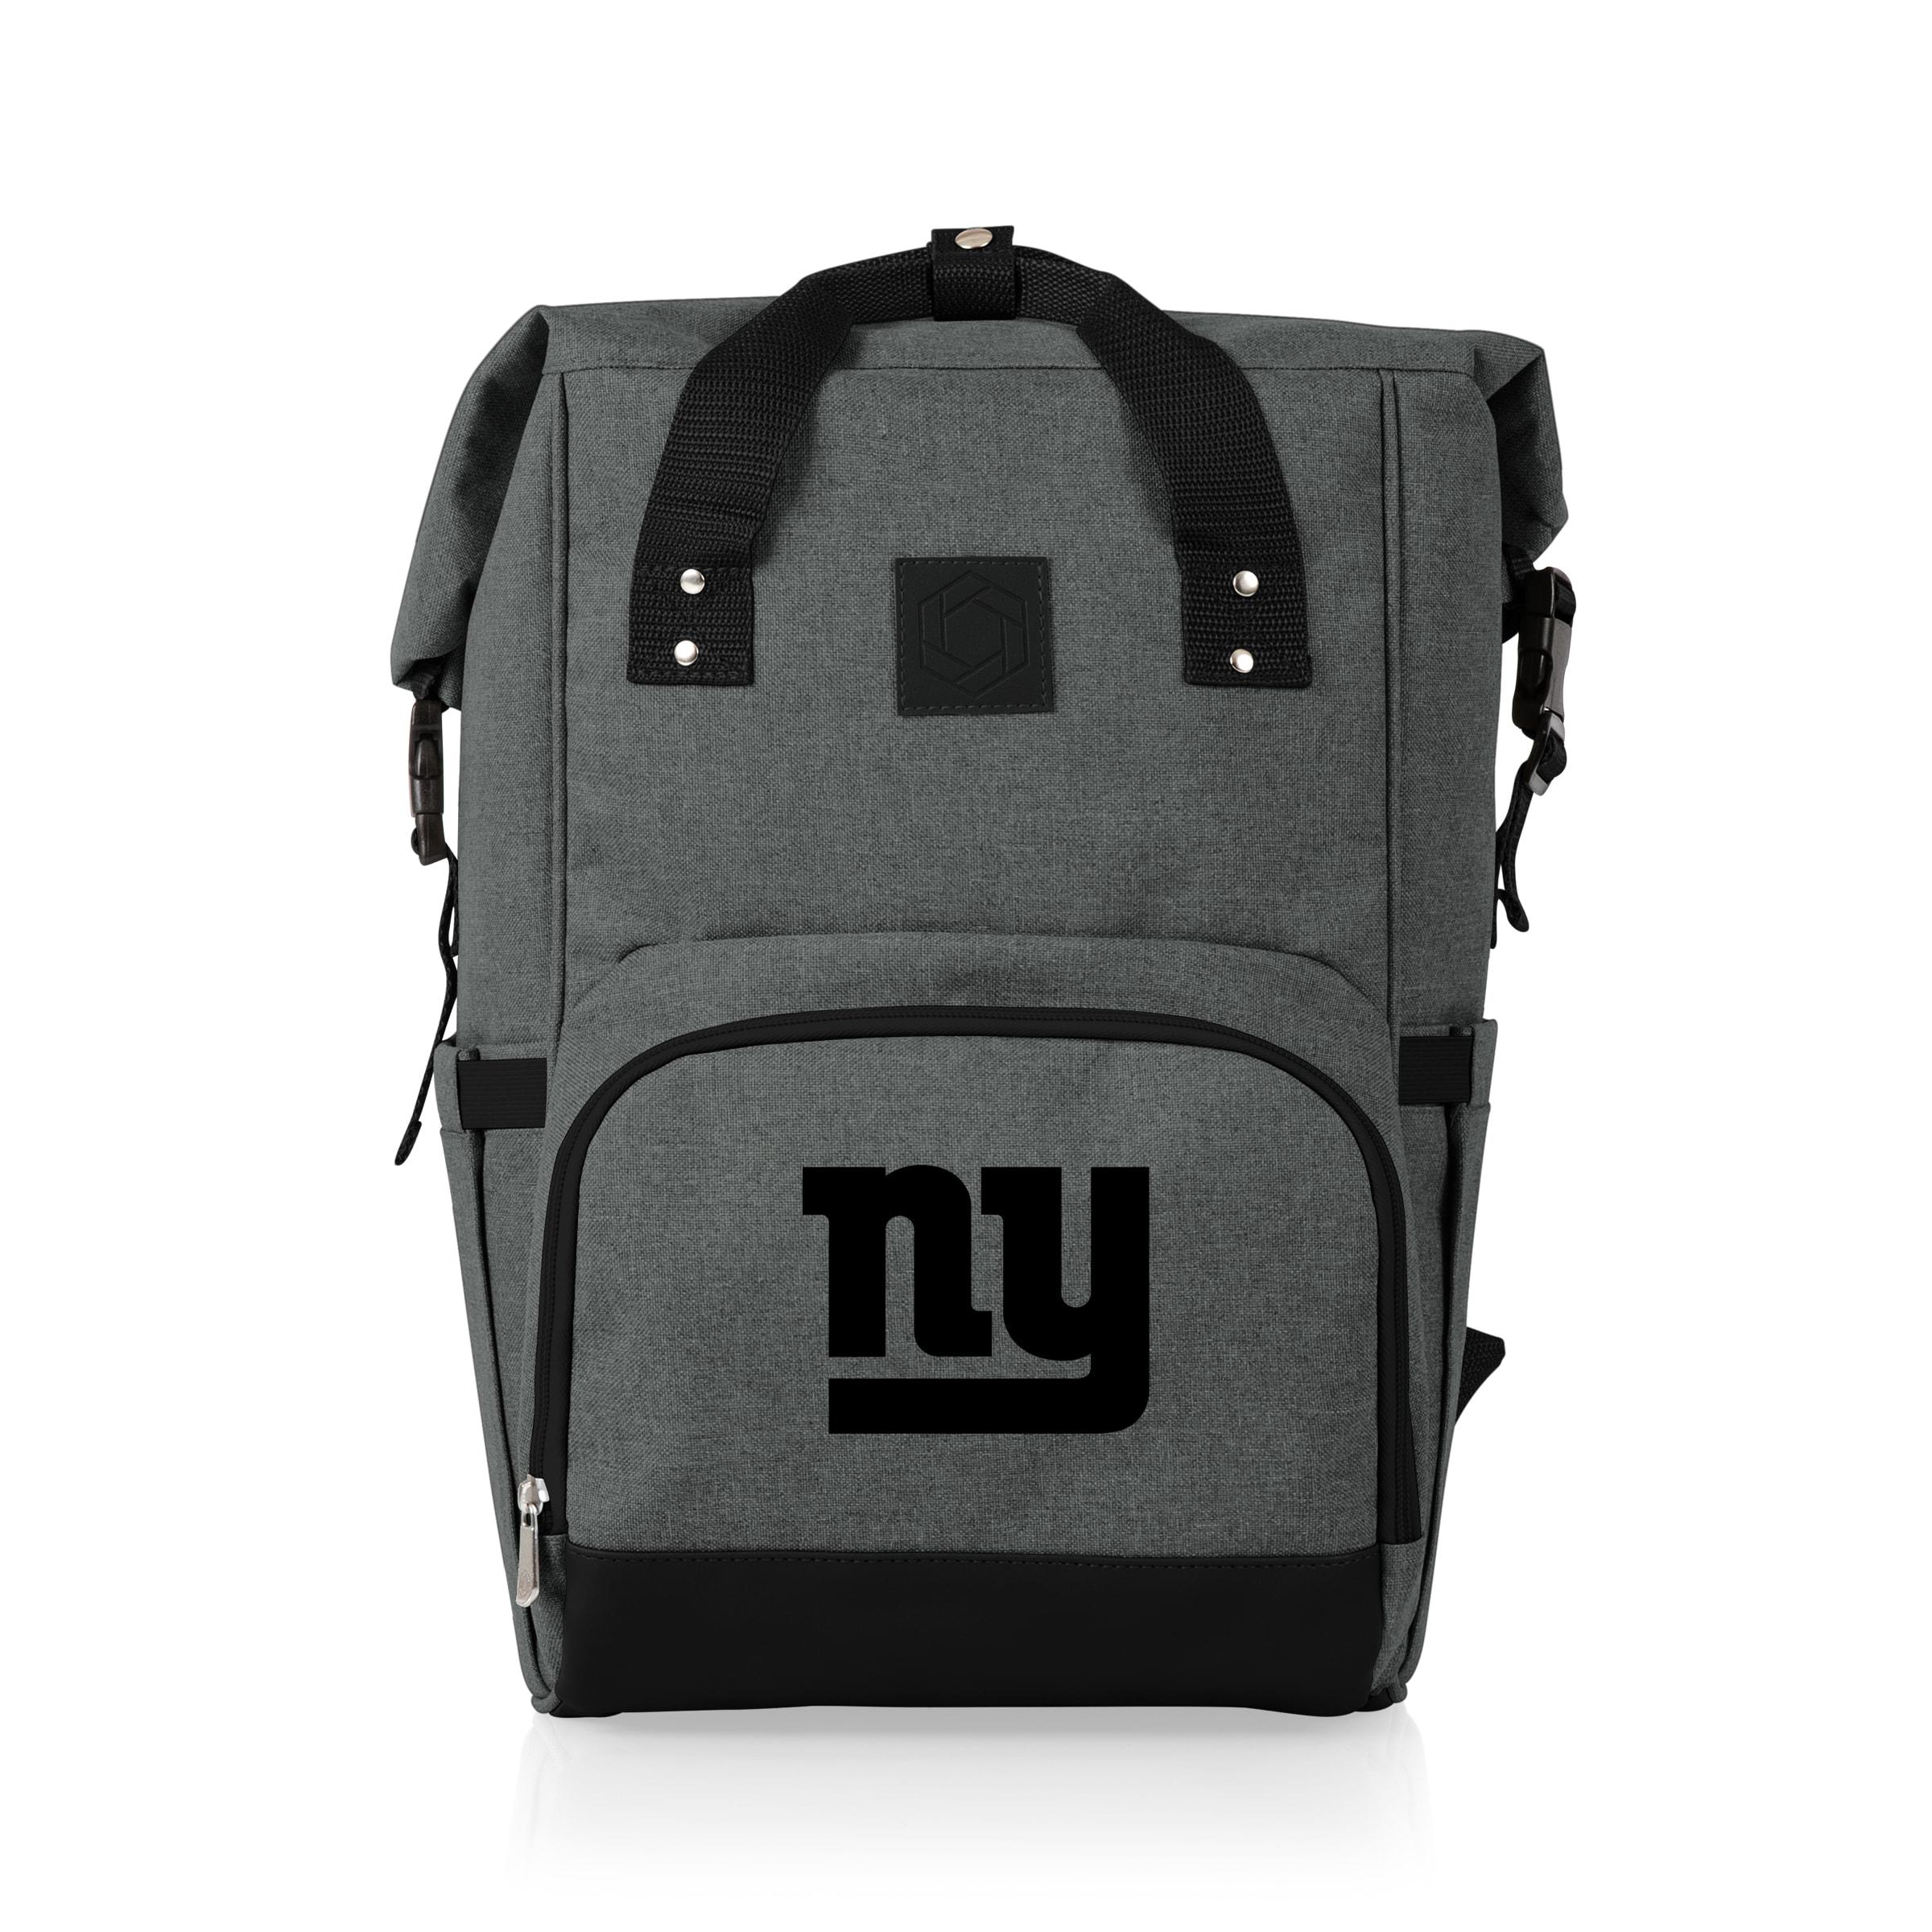 New York Giants Backpack - Gray